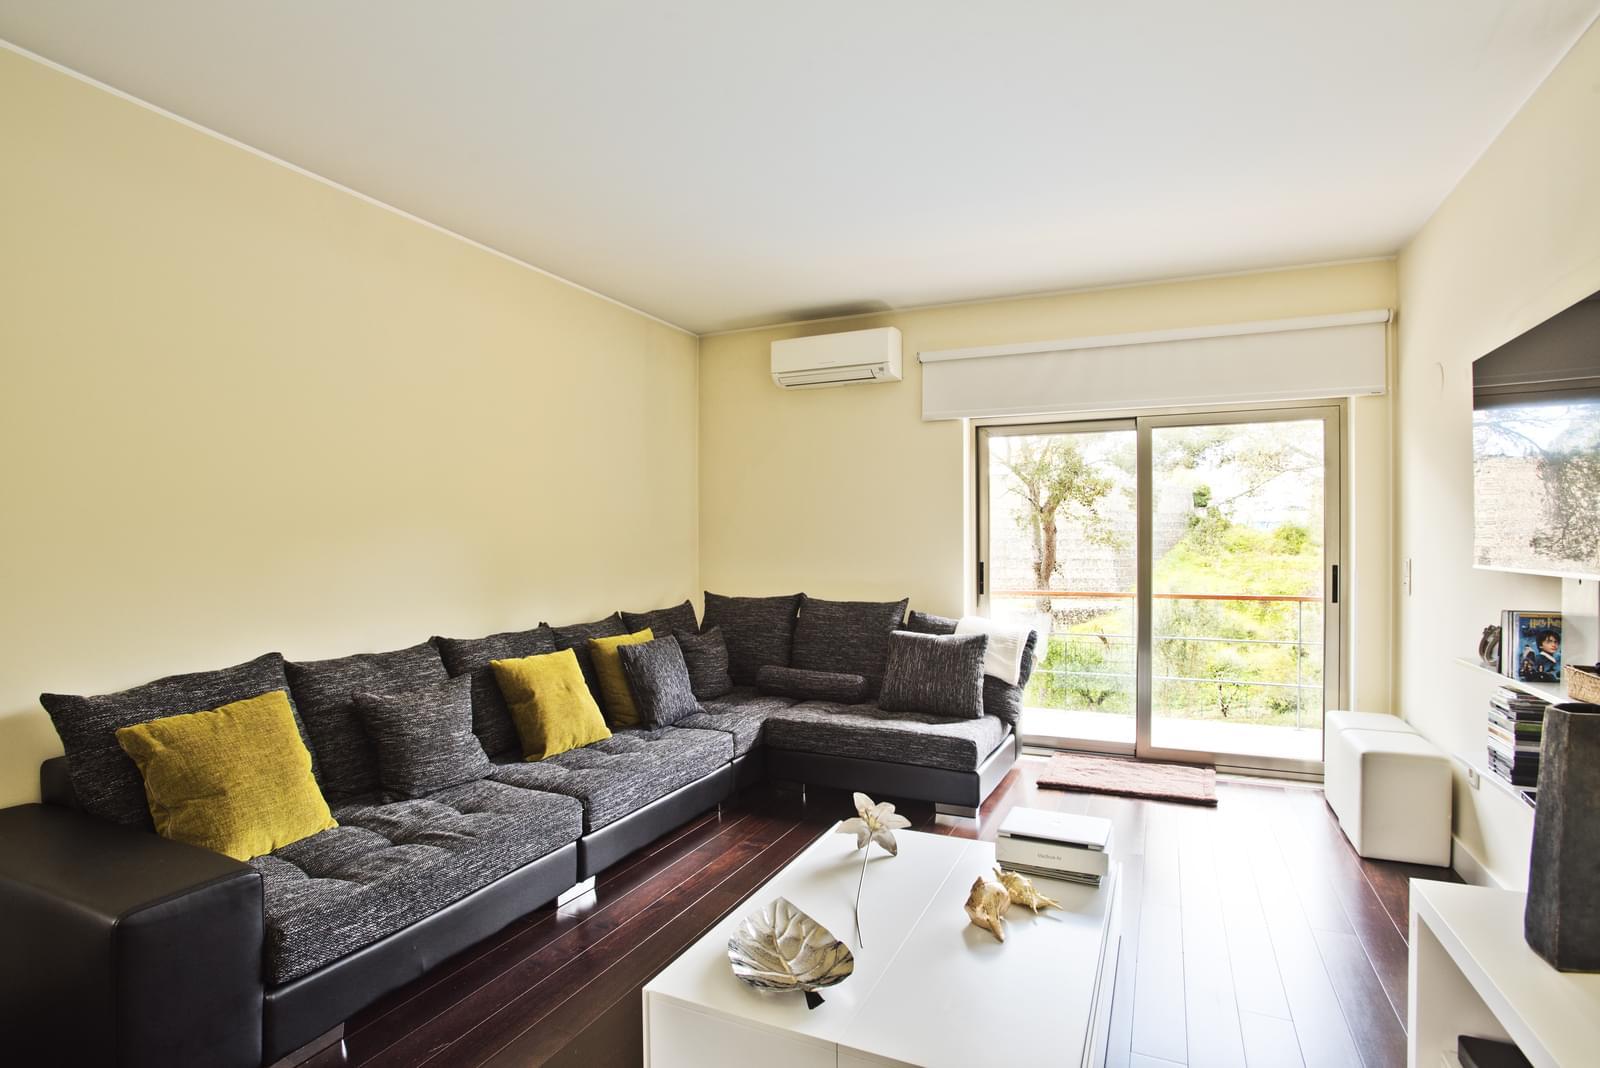 pf16902-apartamento-t3-cascais-a44d3d01-0033-4387-a514-18f44683c131